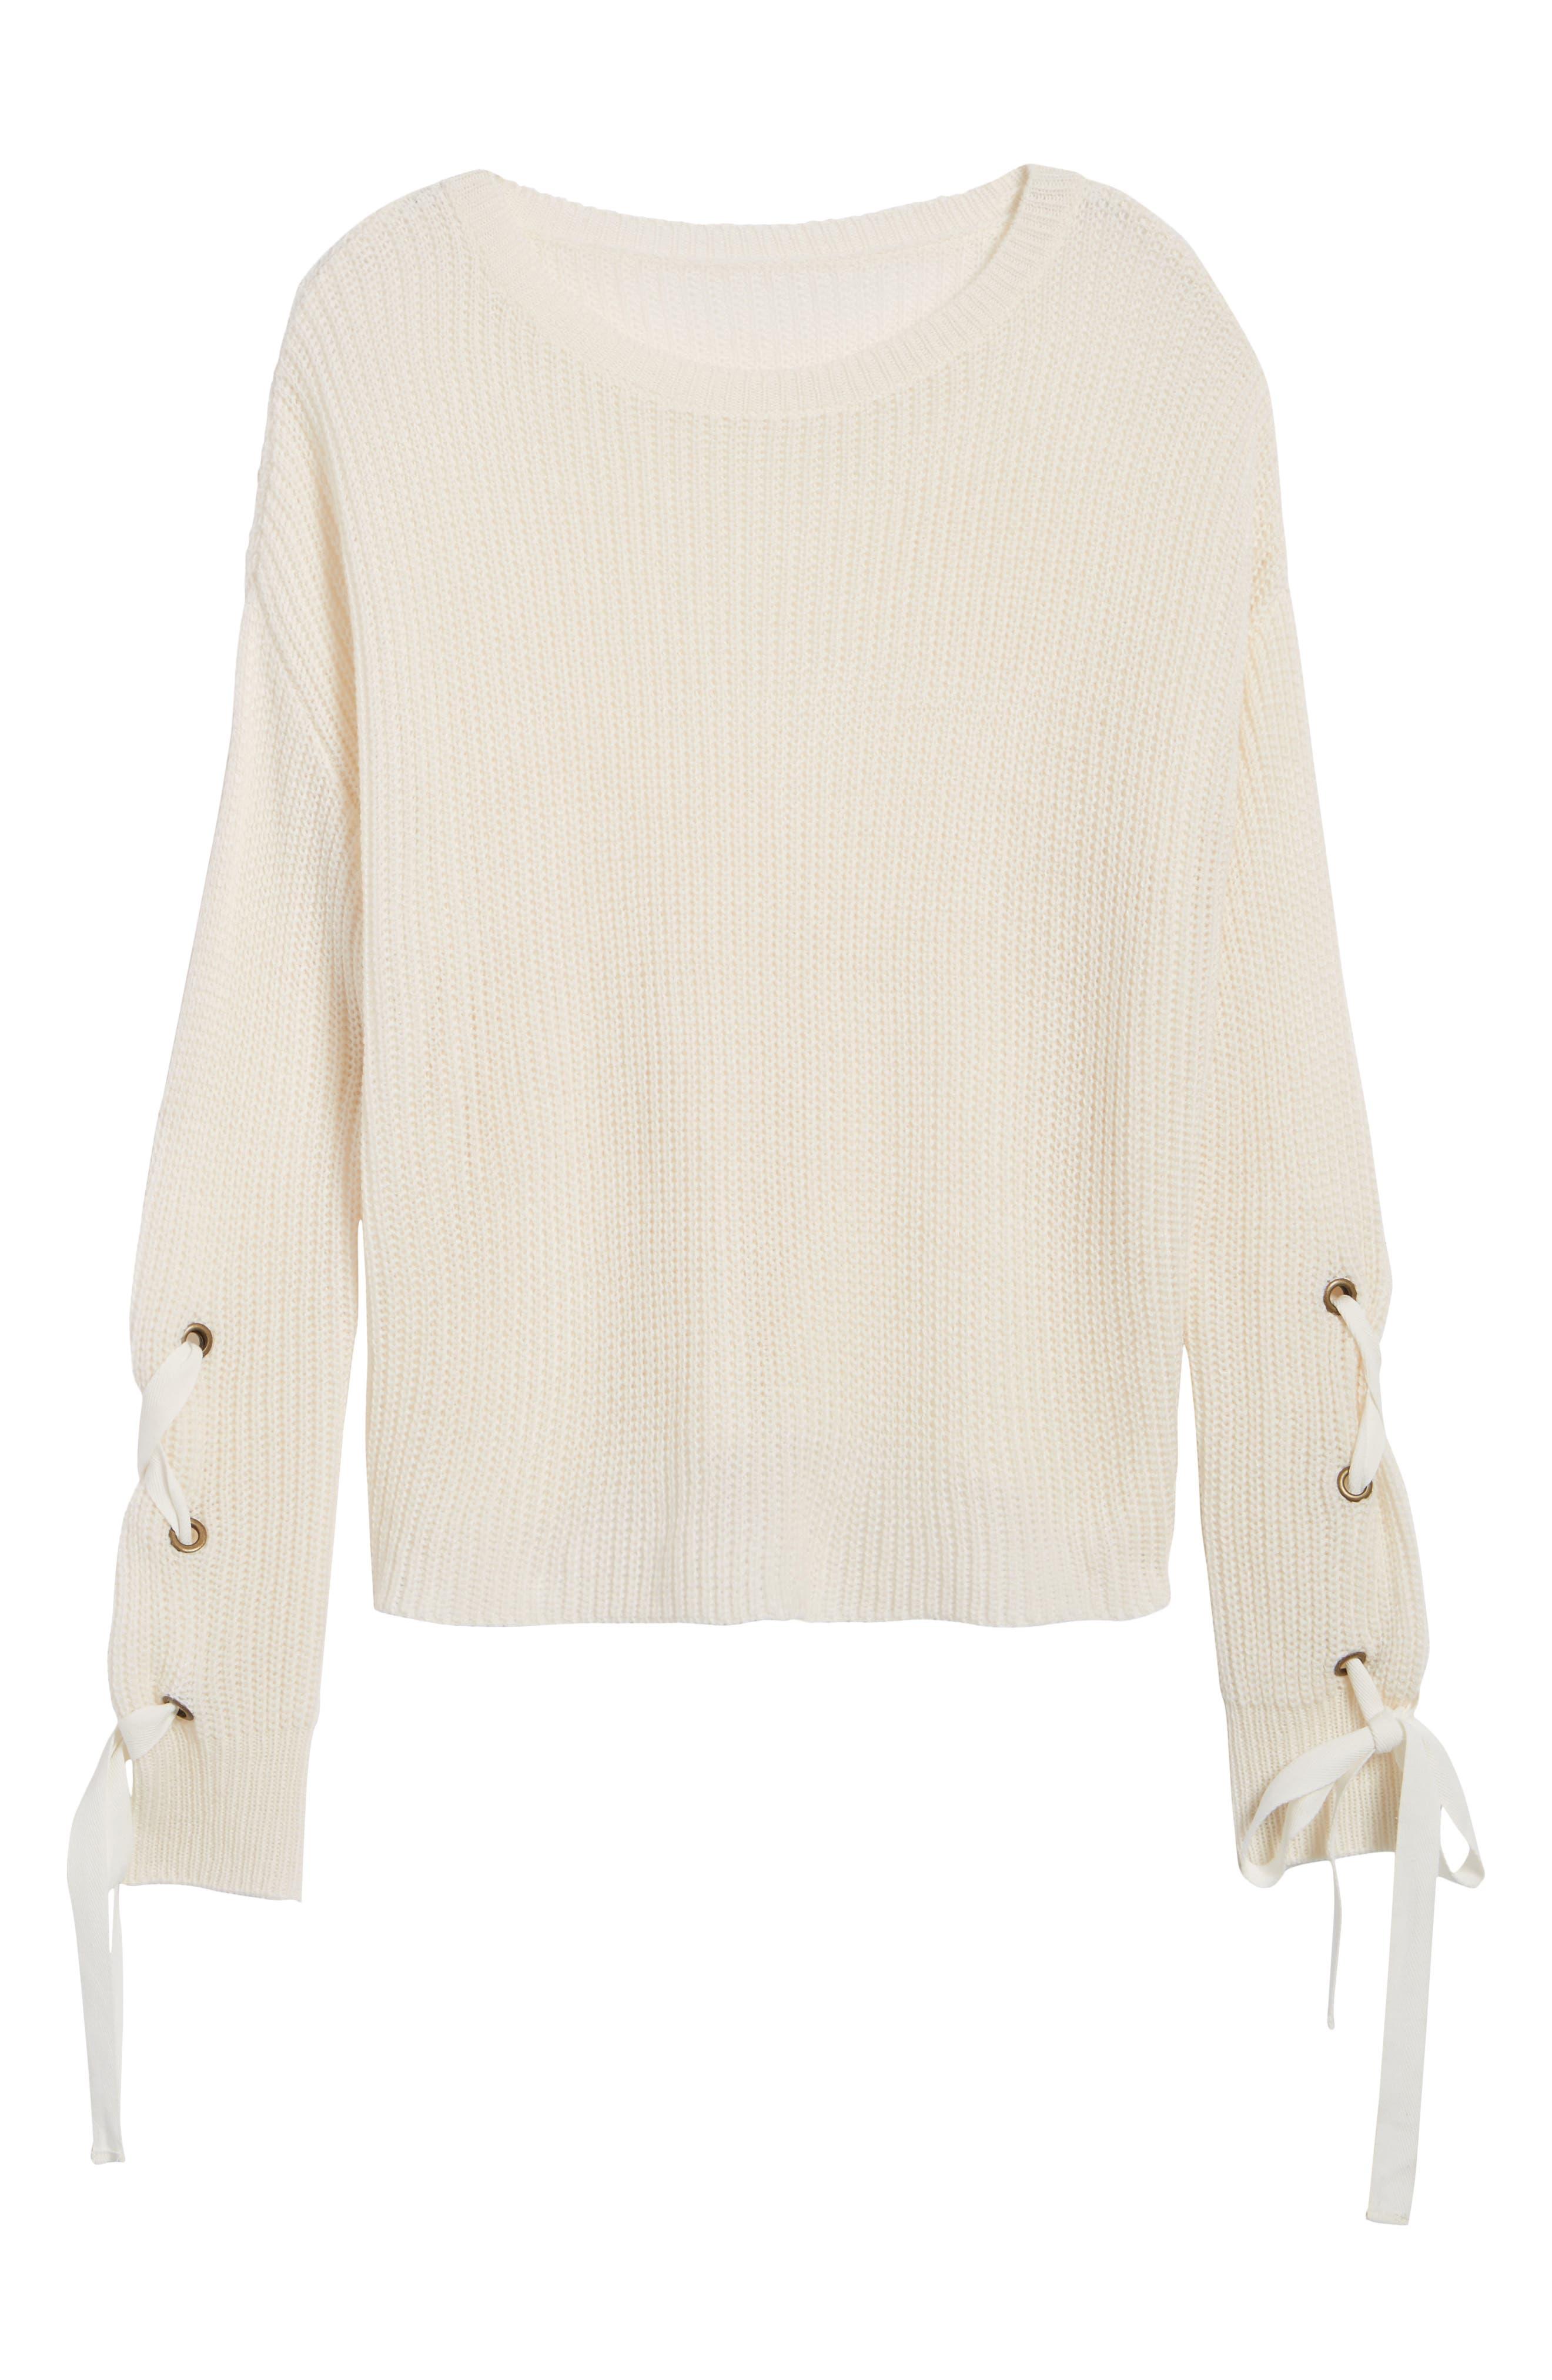 Madison & Berkeley Laced Sleeve Sweater